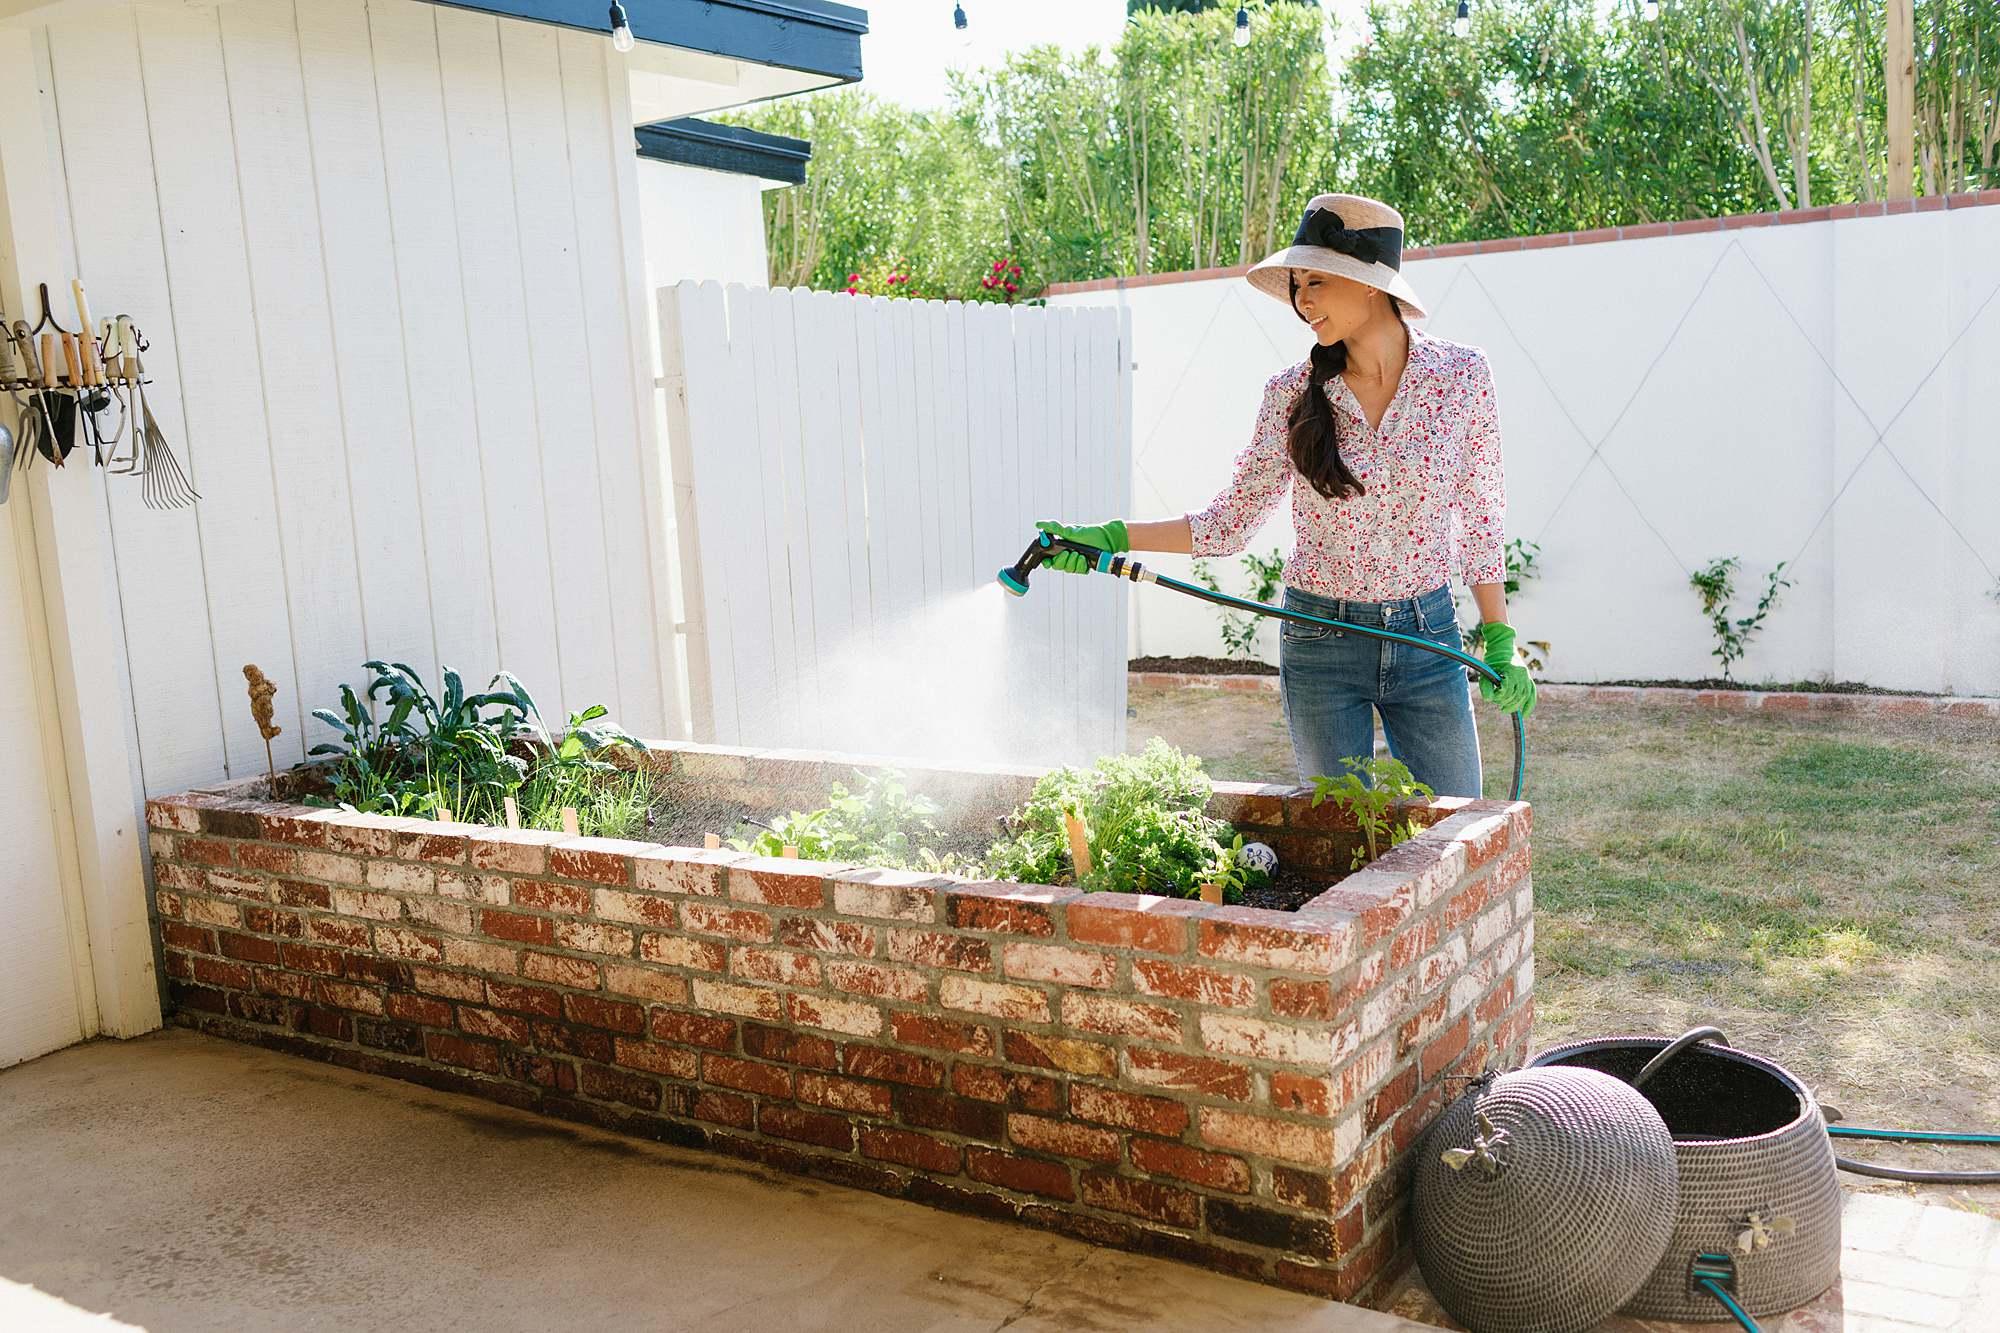 lightweight durable hose by gilmour - garden backyard raised garden beds // arizona phoenix home and garden lifestyle blogger Diana elizabeth